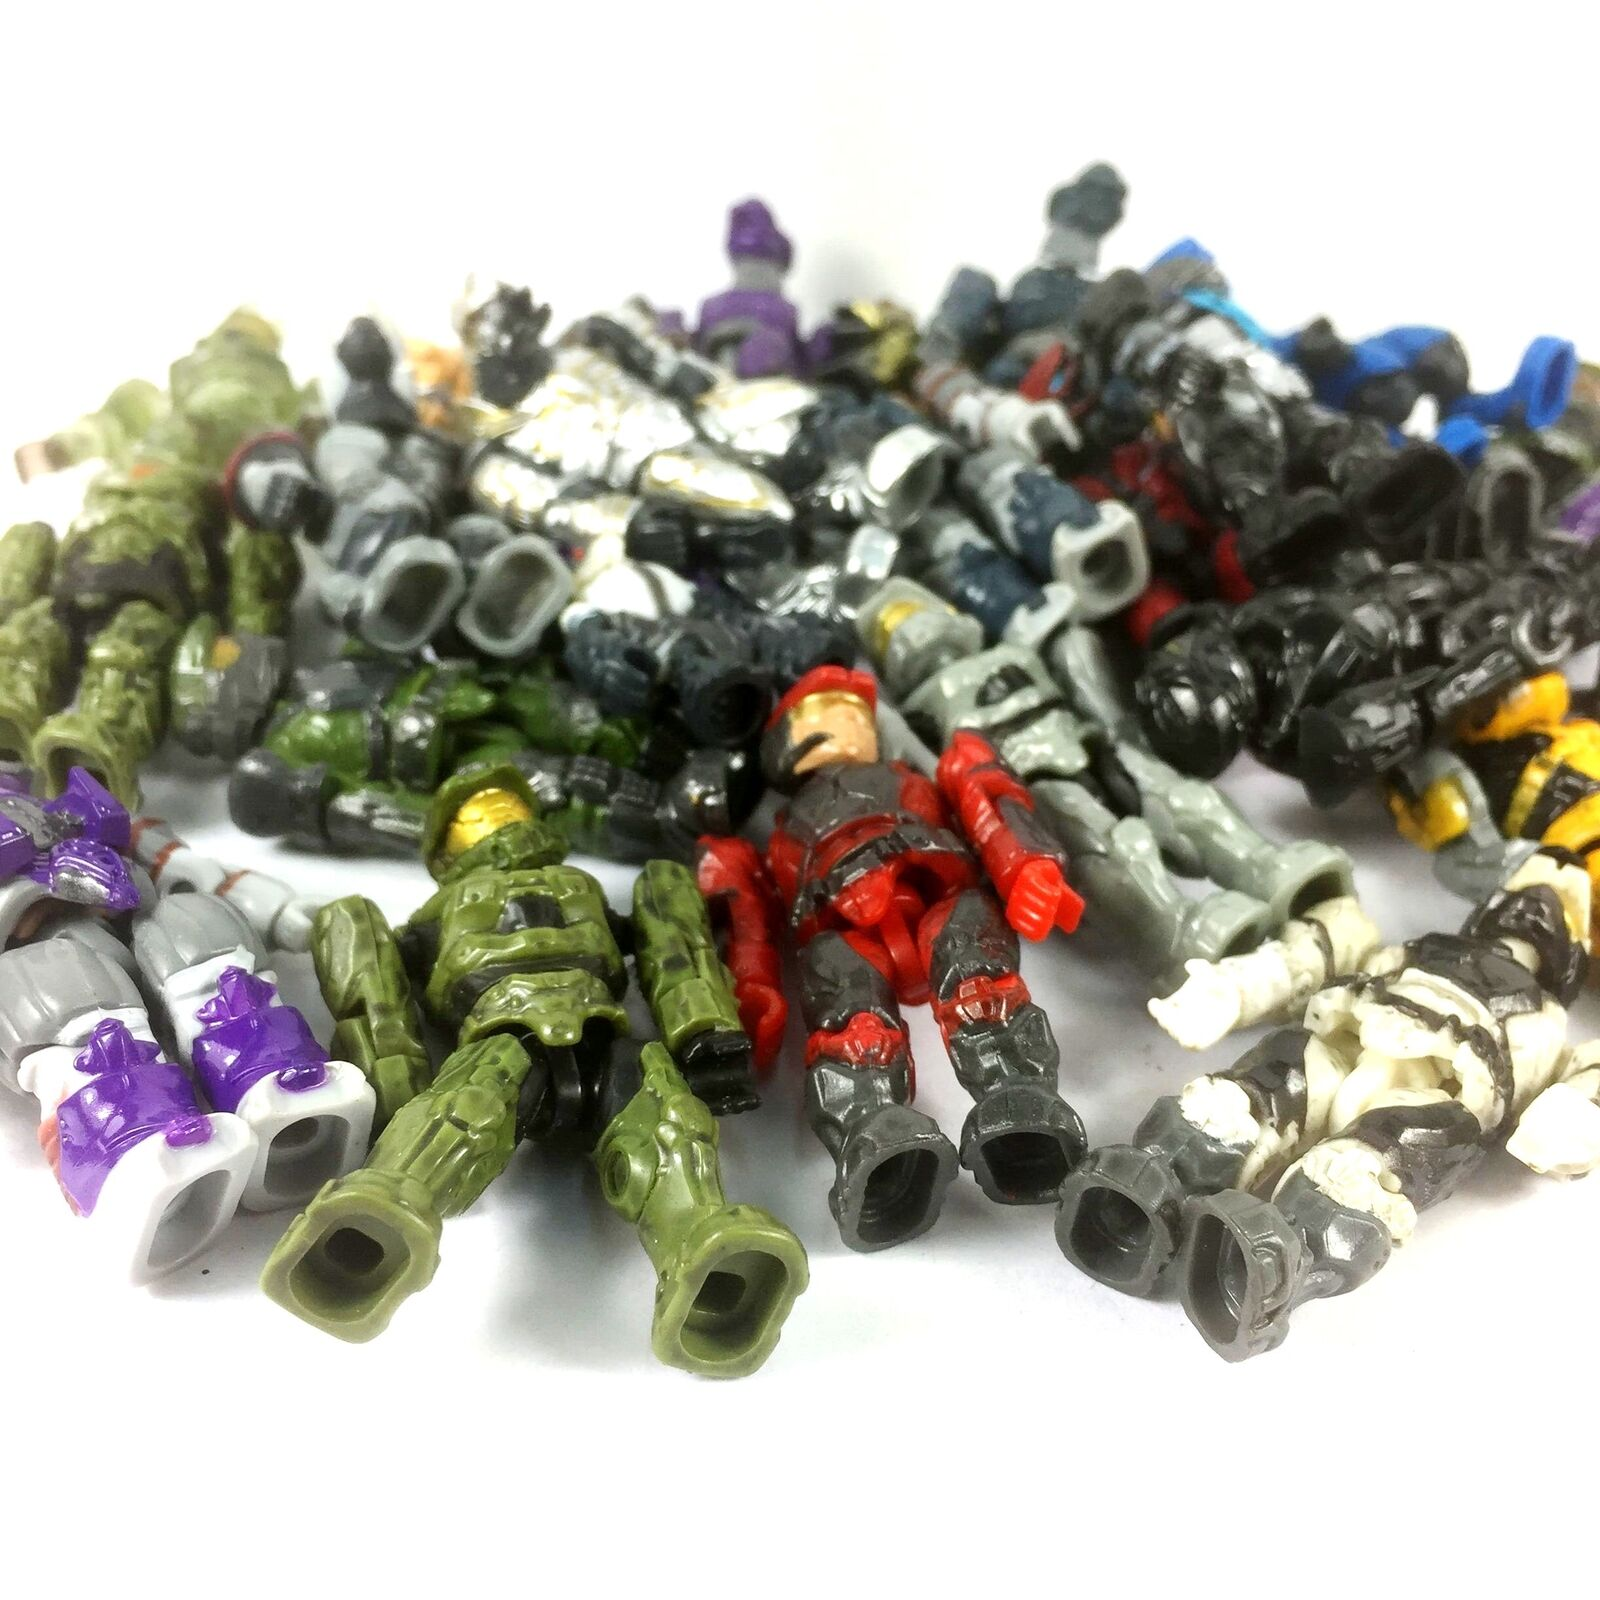 random 40PCS Different Halo Mega Block Building toy mini Figure Xmas Gift Toy